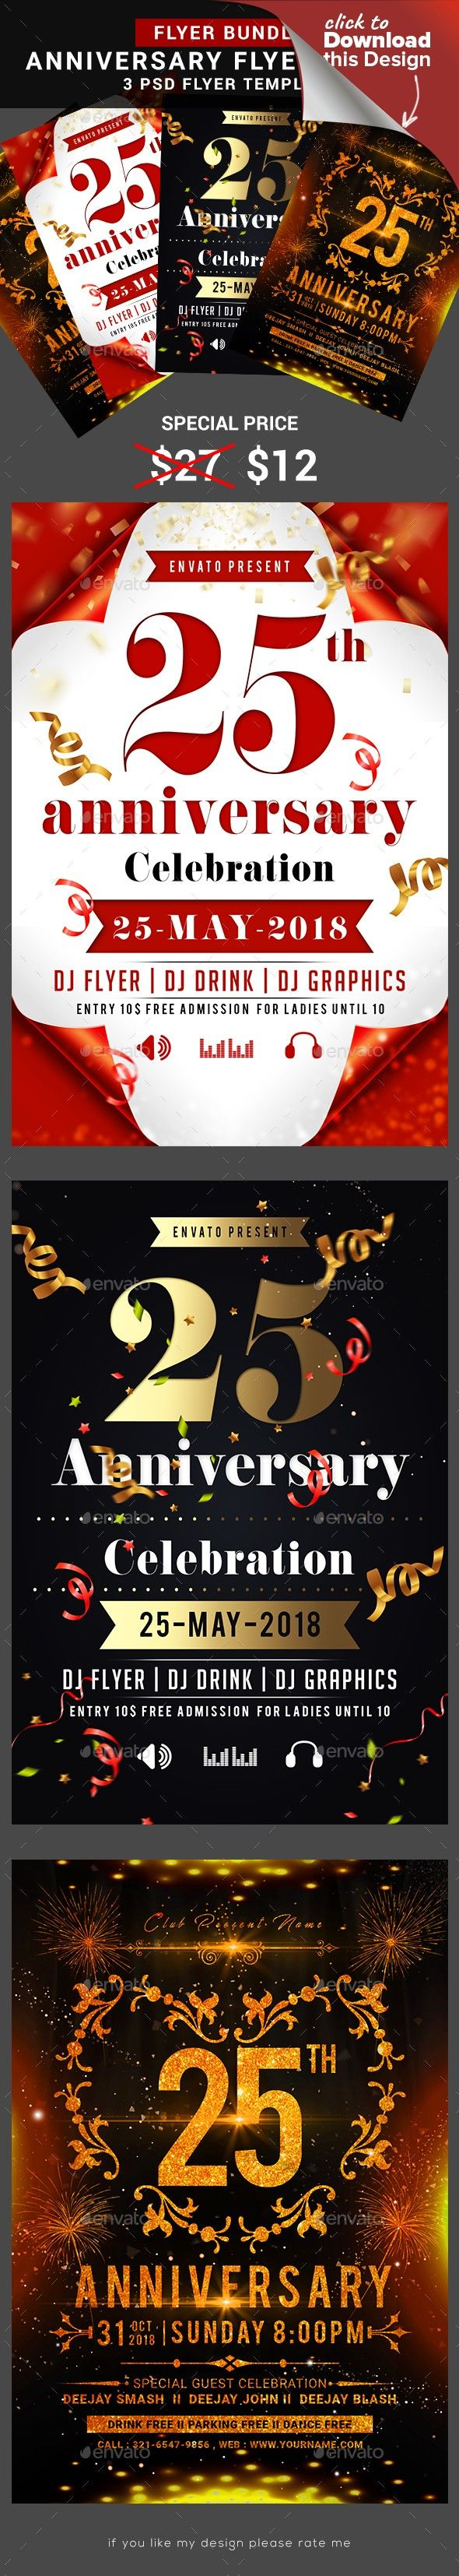 Anniversary Flyer Bundle Birthday flyer, Flyer, Flyer